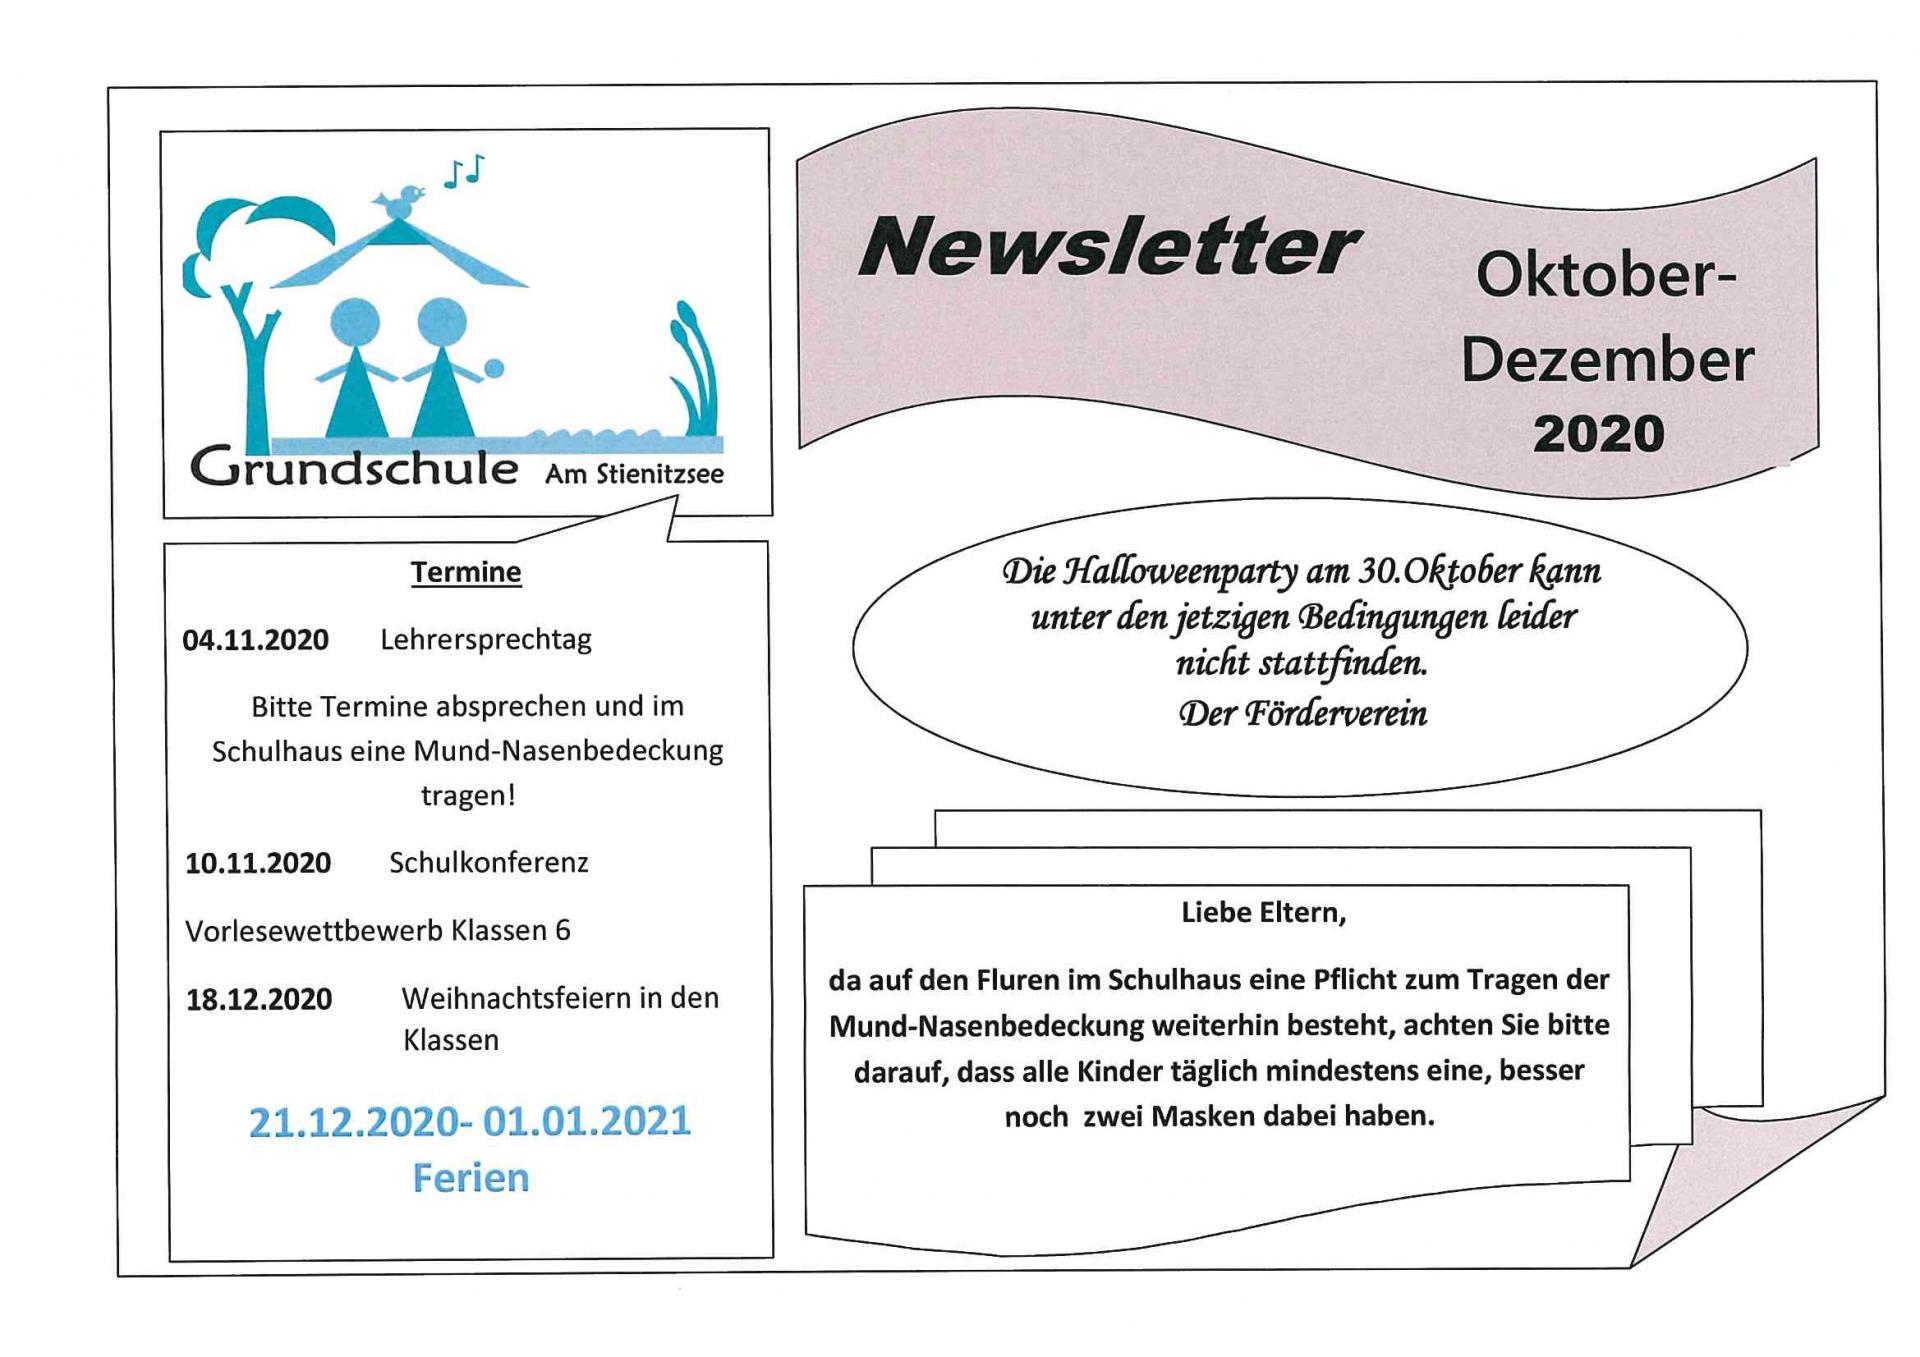 Newsletter Okt-Dez 2020